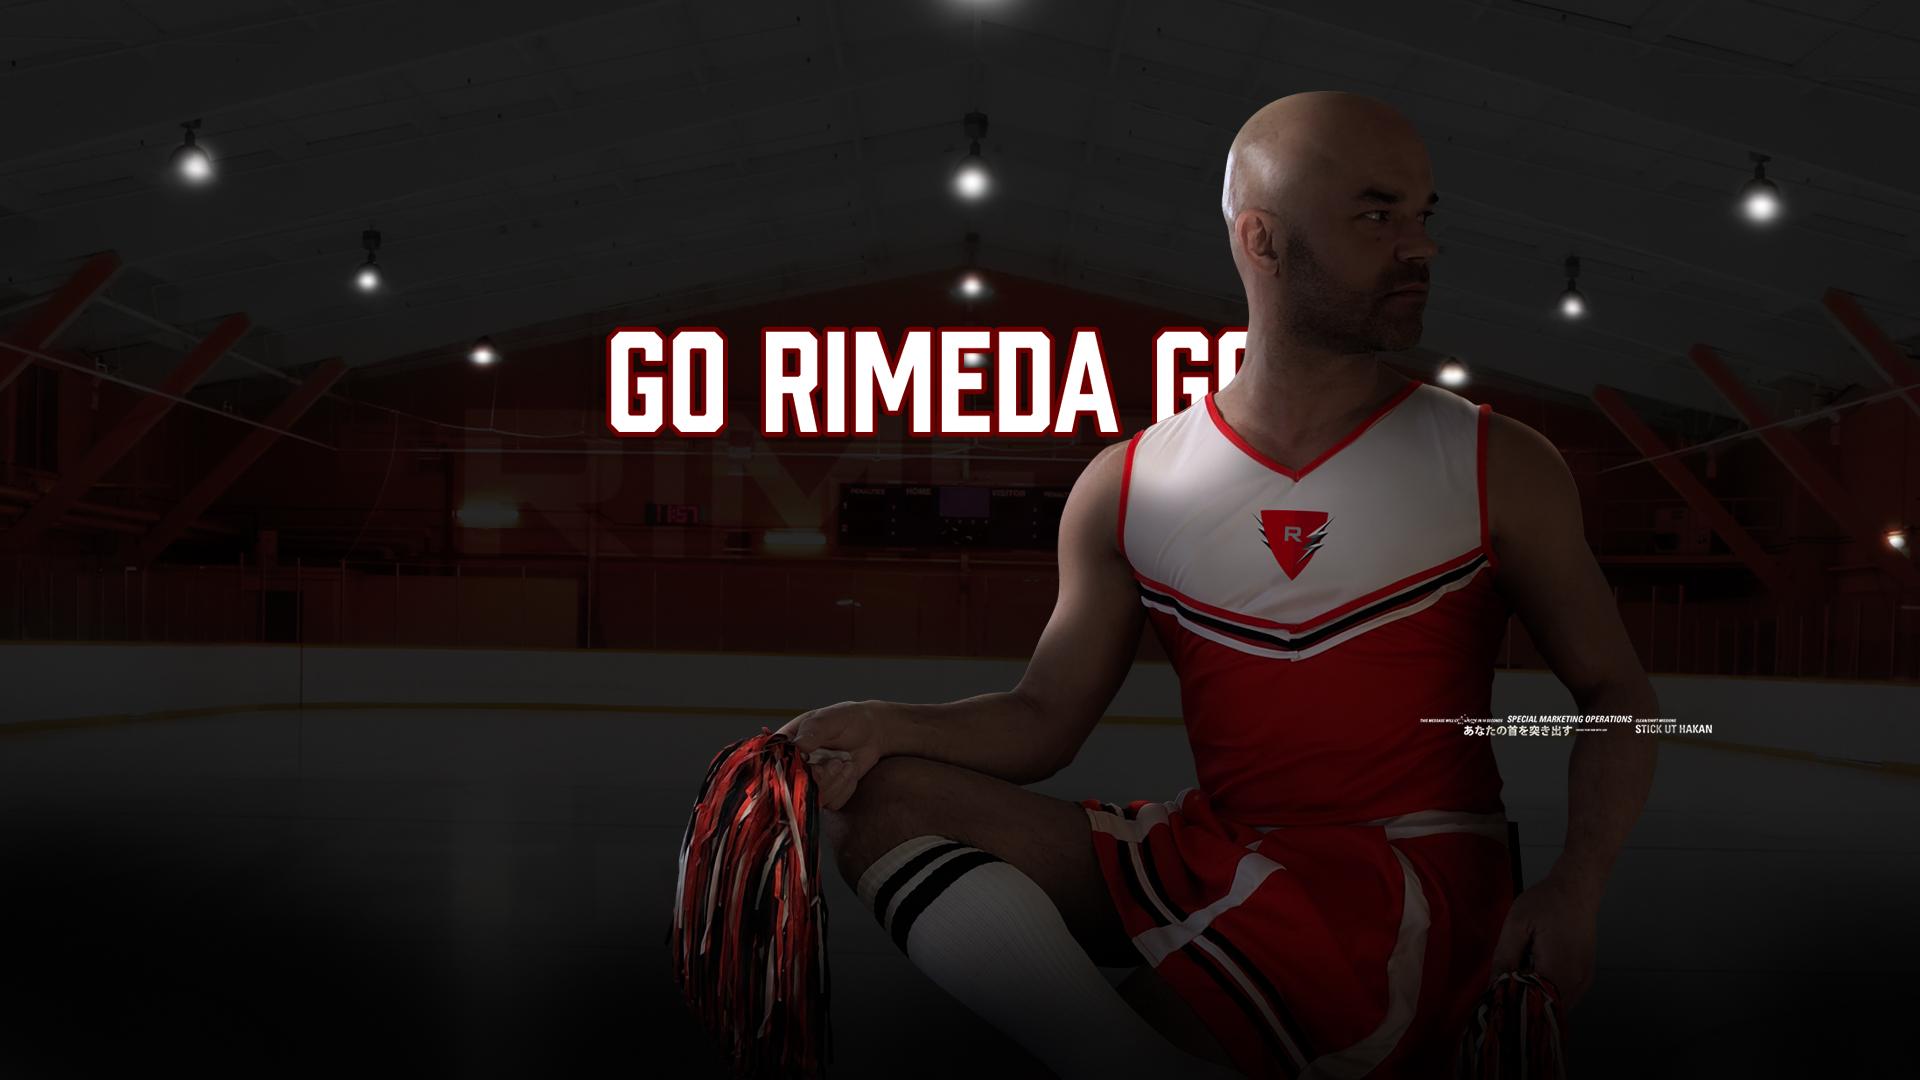 rimeda_1920-1.jpg